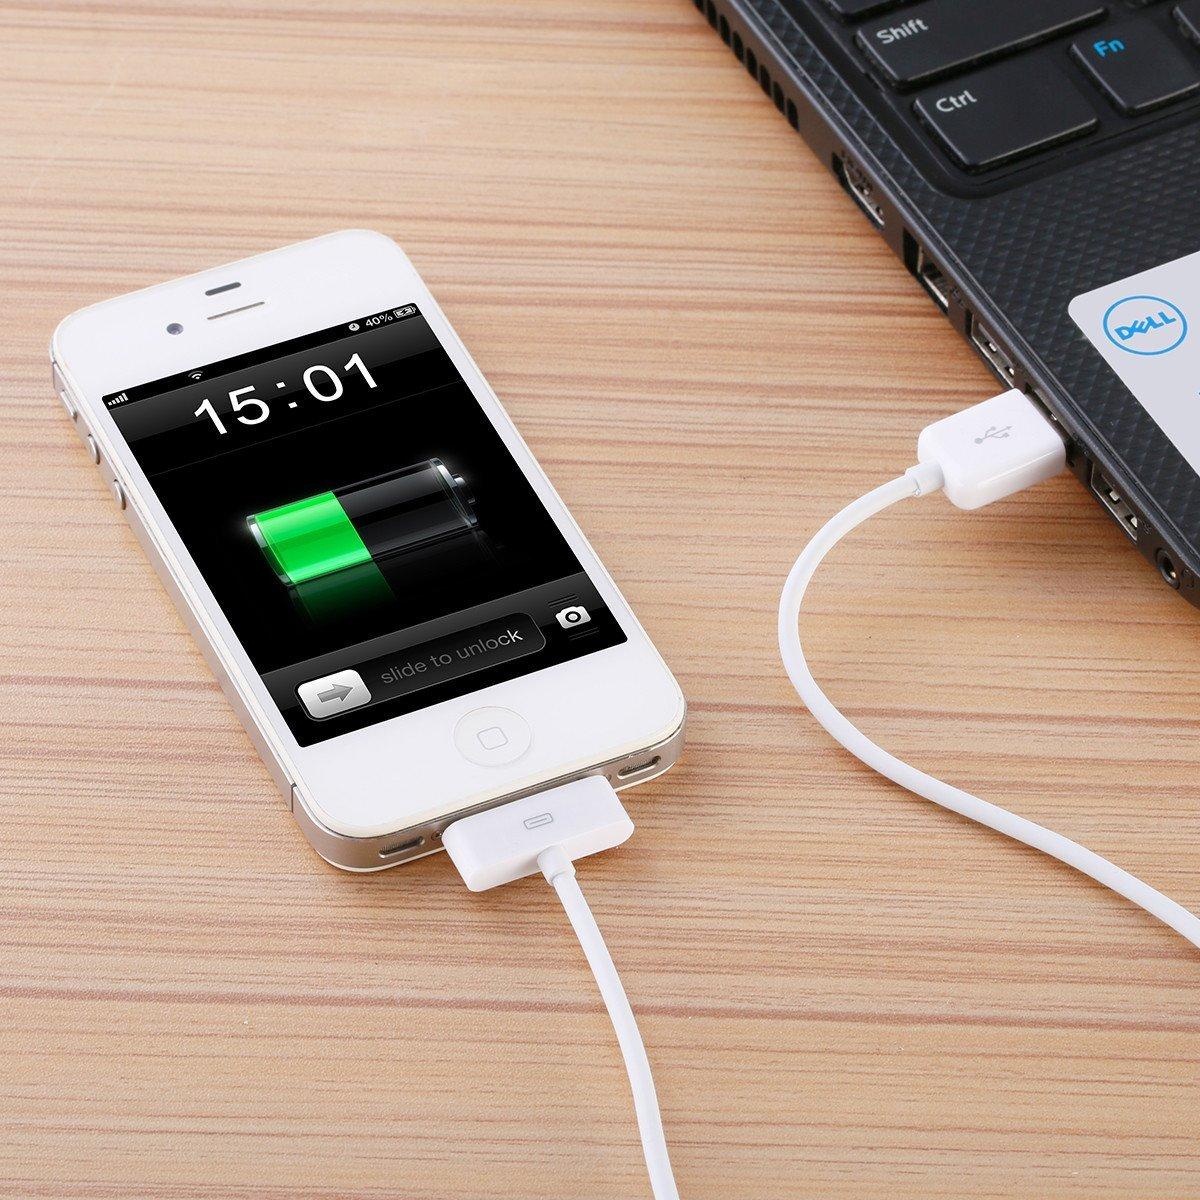 POWERADD, Cable USB para iPhone 4S / 4, Carga rápida, Ligero portátil